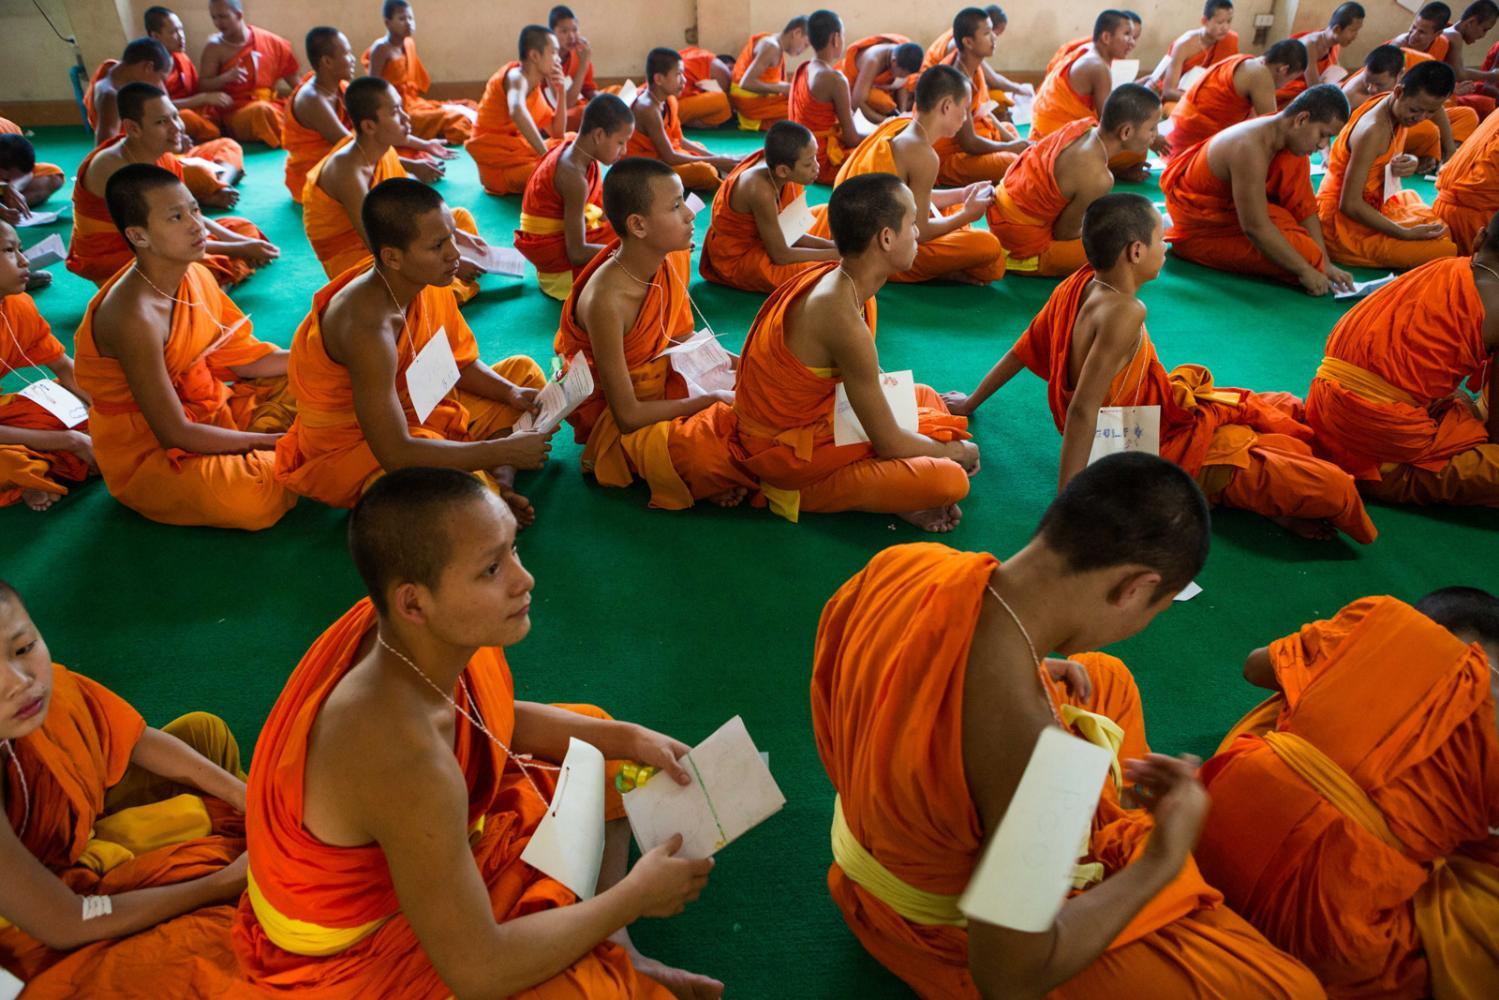 Novice monks at an educational program in Nakhon Sawan, Thailand